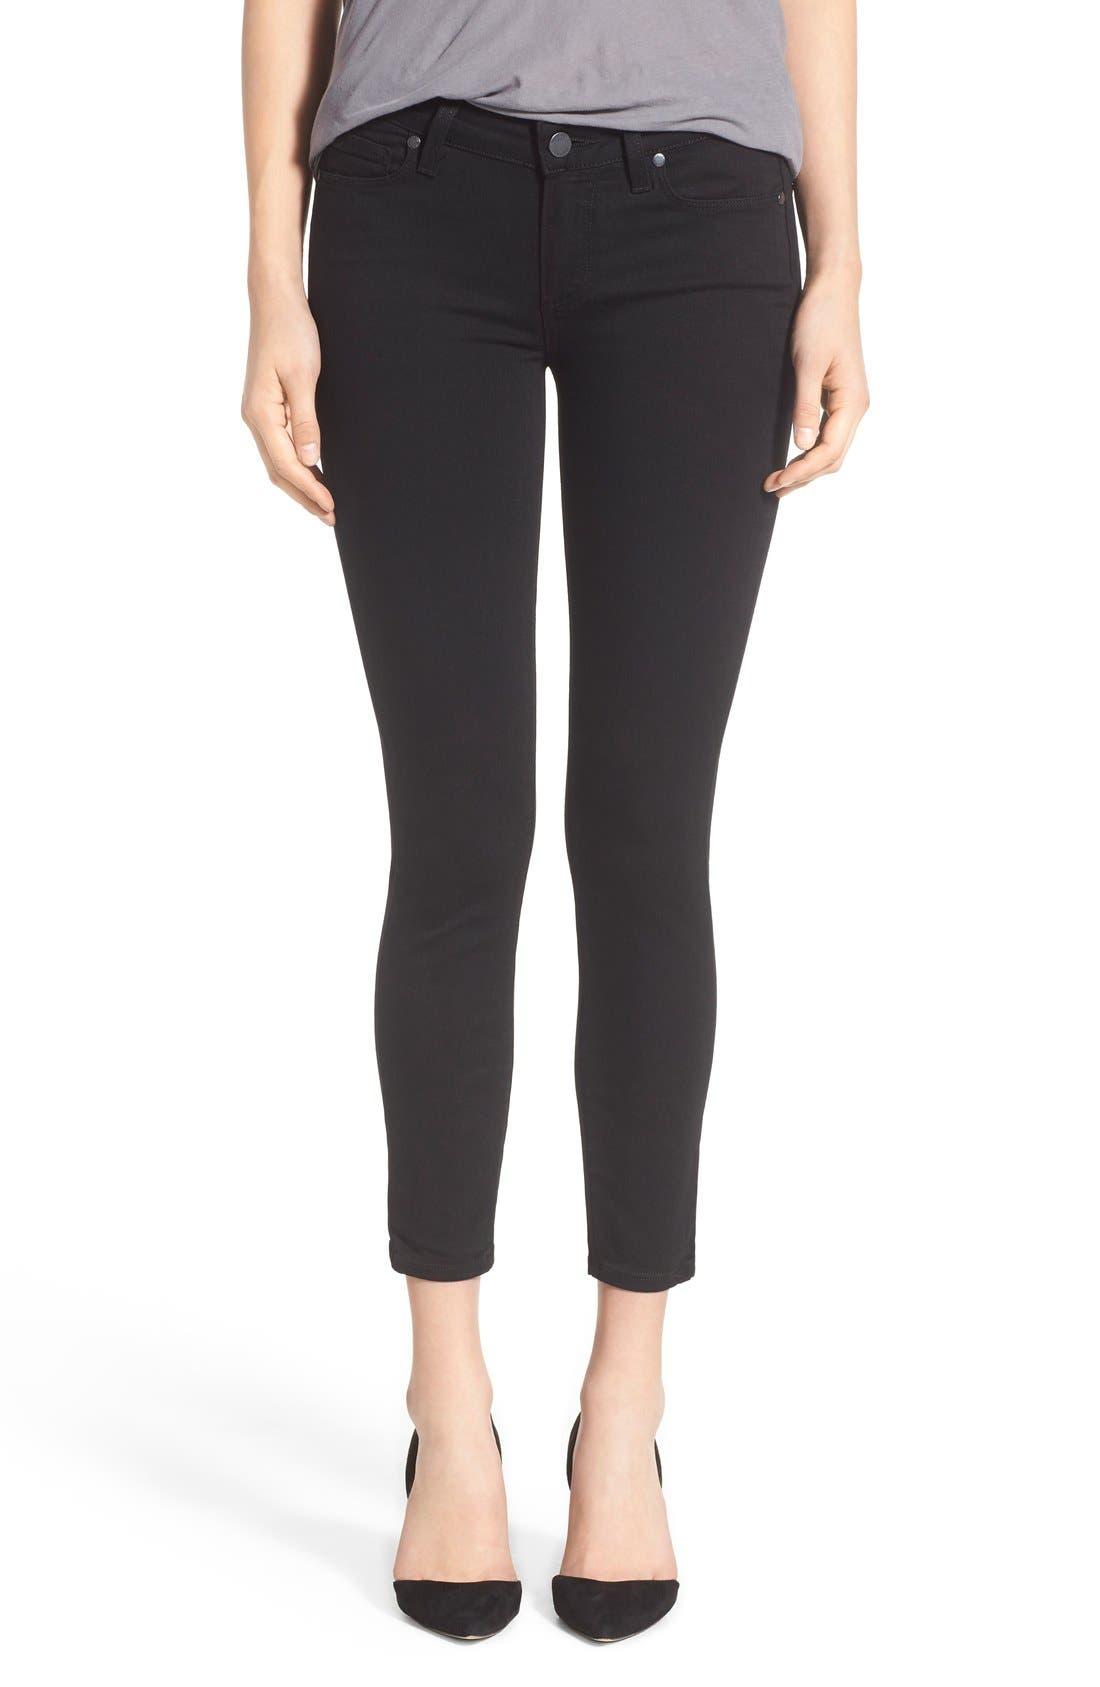 Transcend - Verdugo Crop Skinny Jeans,                         Main,                         color, Black